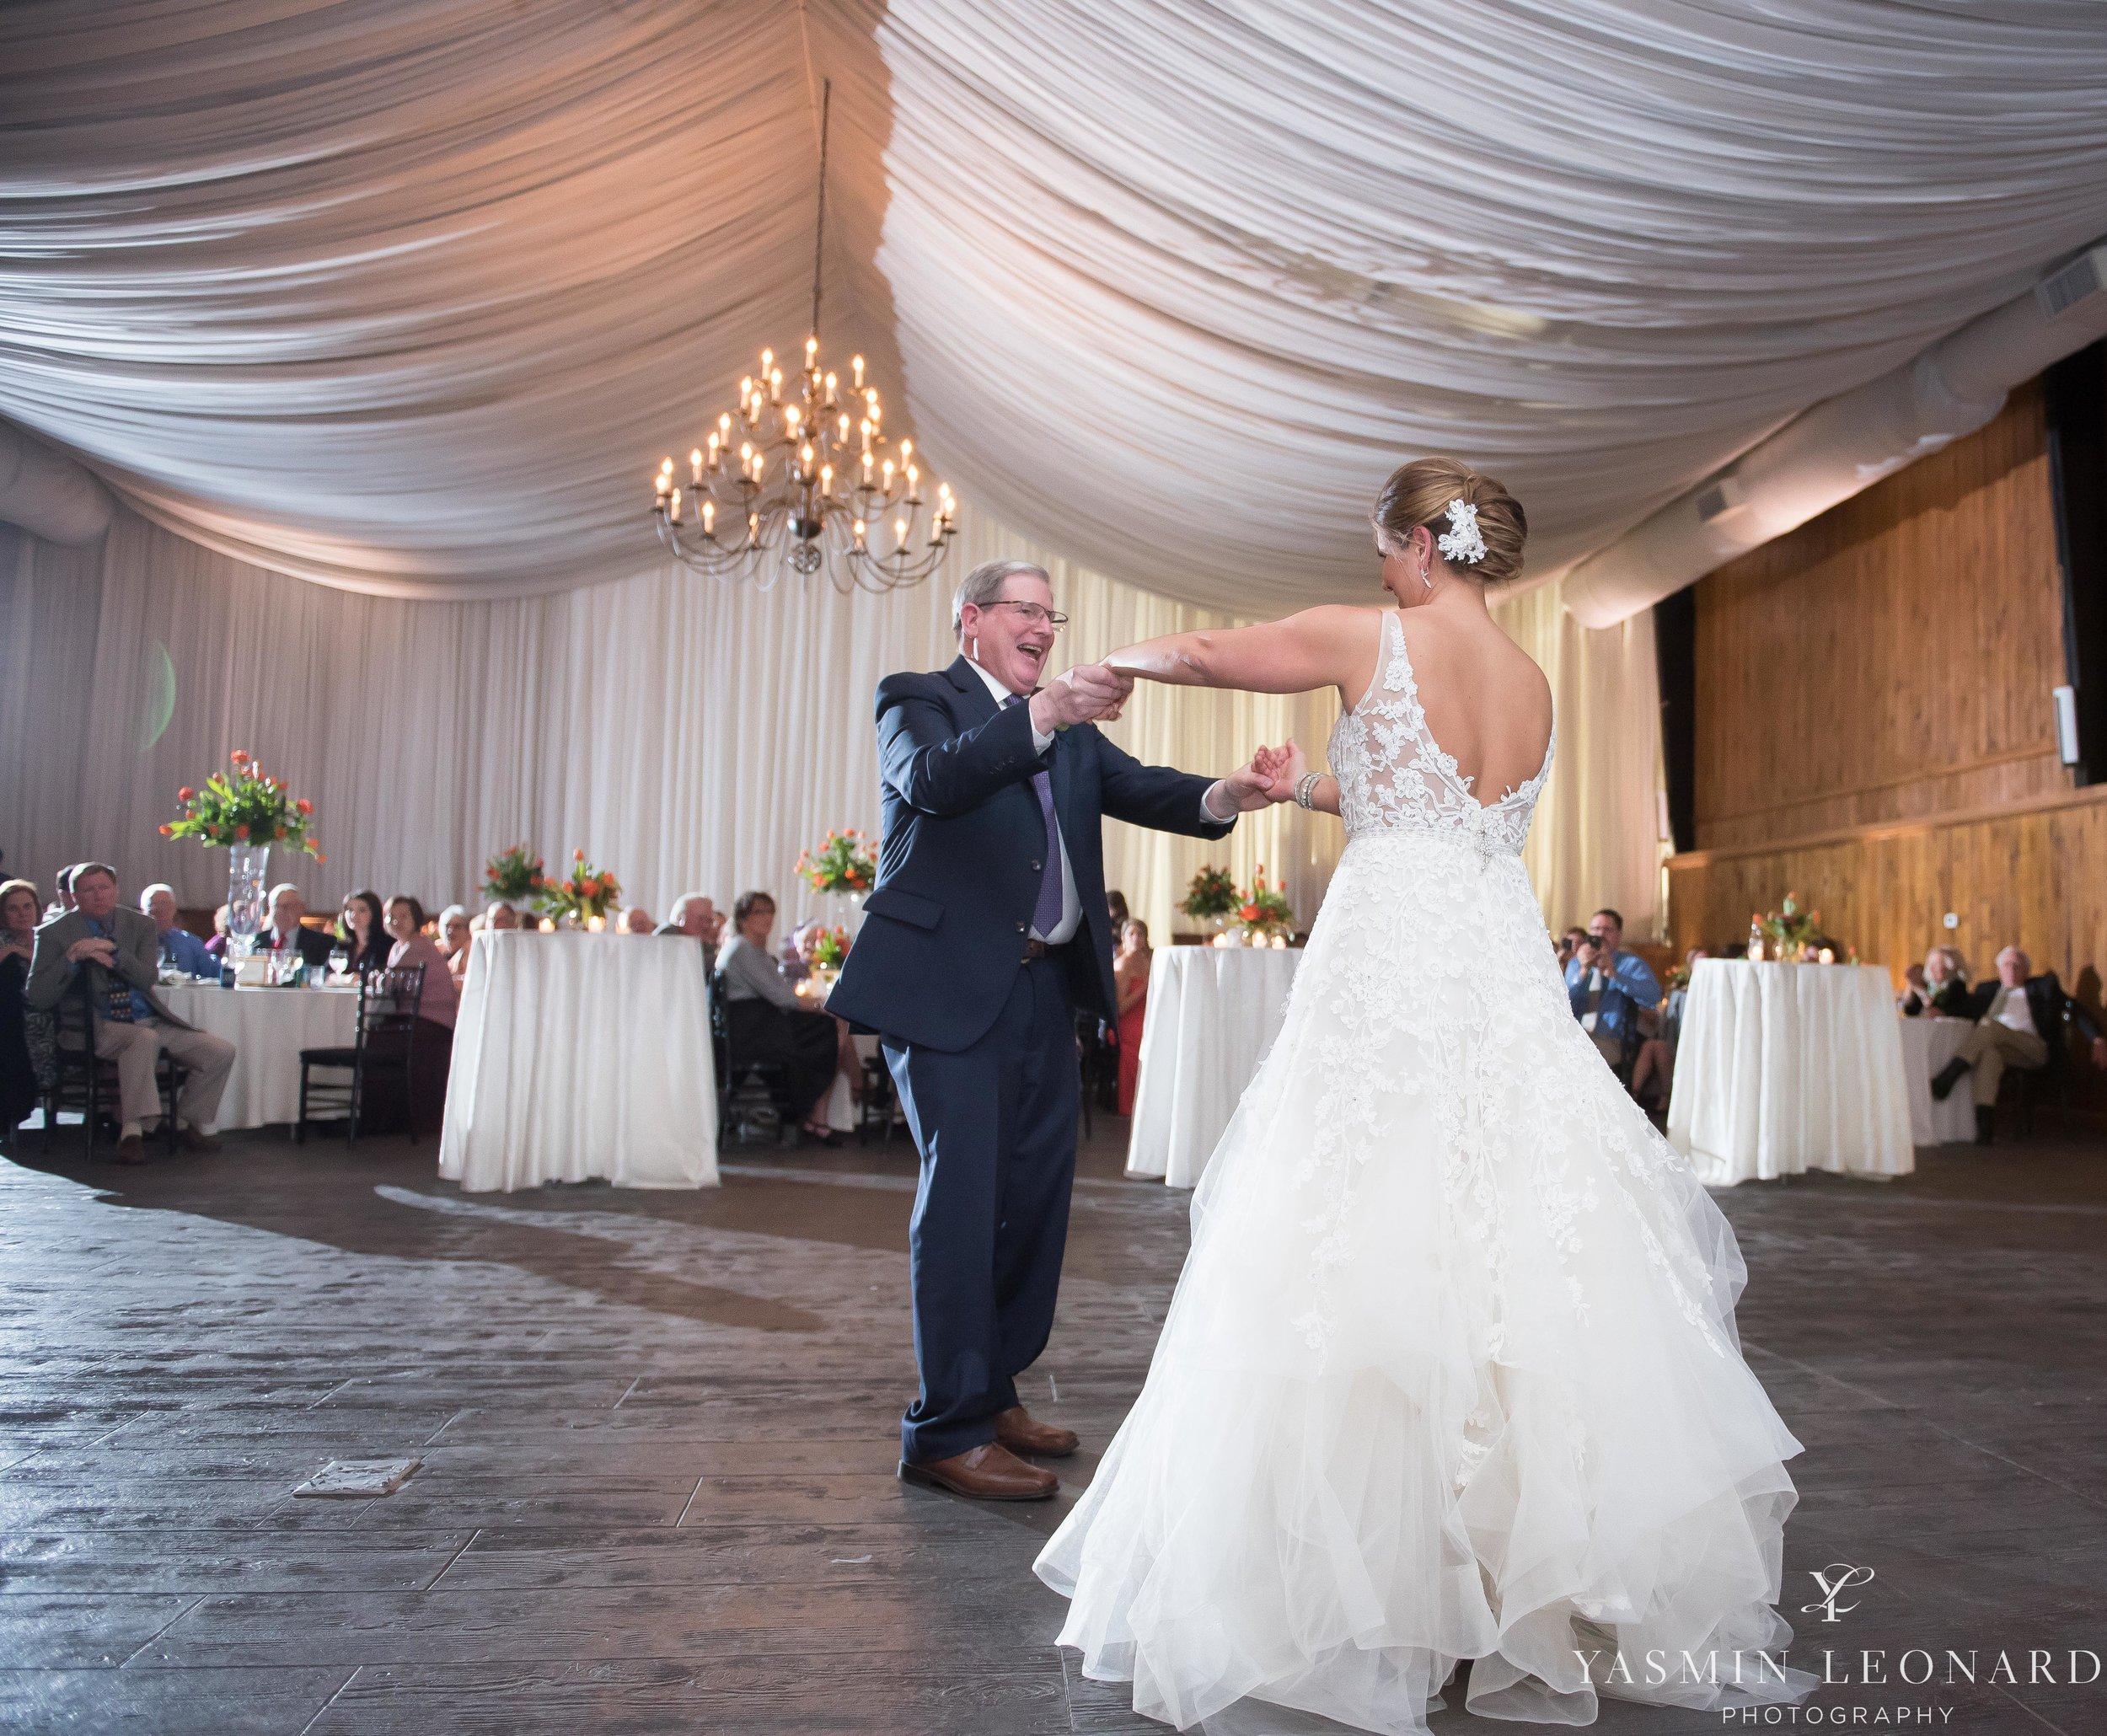 Adaumont Farm - Adaumont Farm Weddings - Trinity Weddings - NC Weddings - Yasmin Leonard Photography-71.jpg